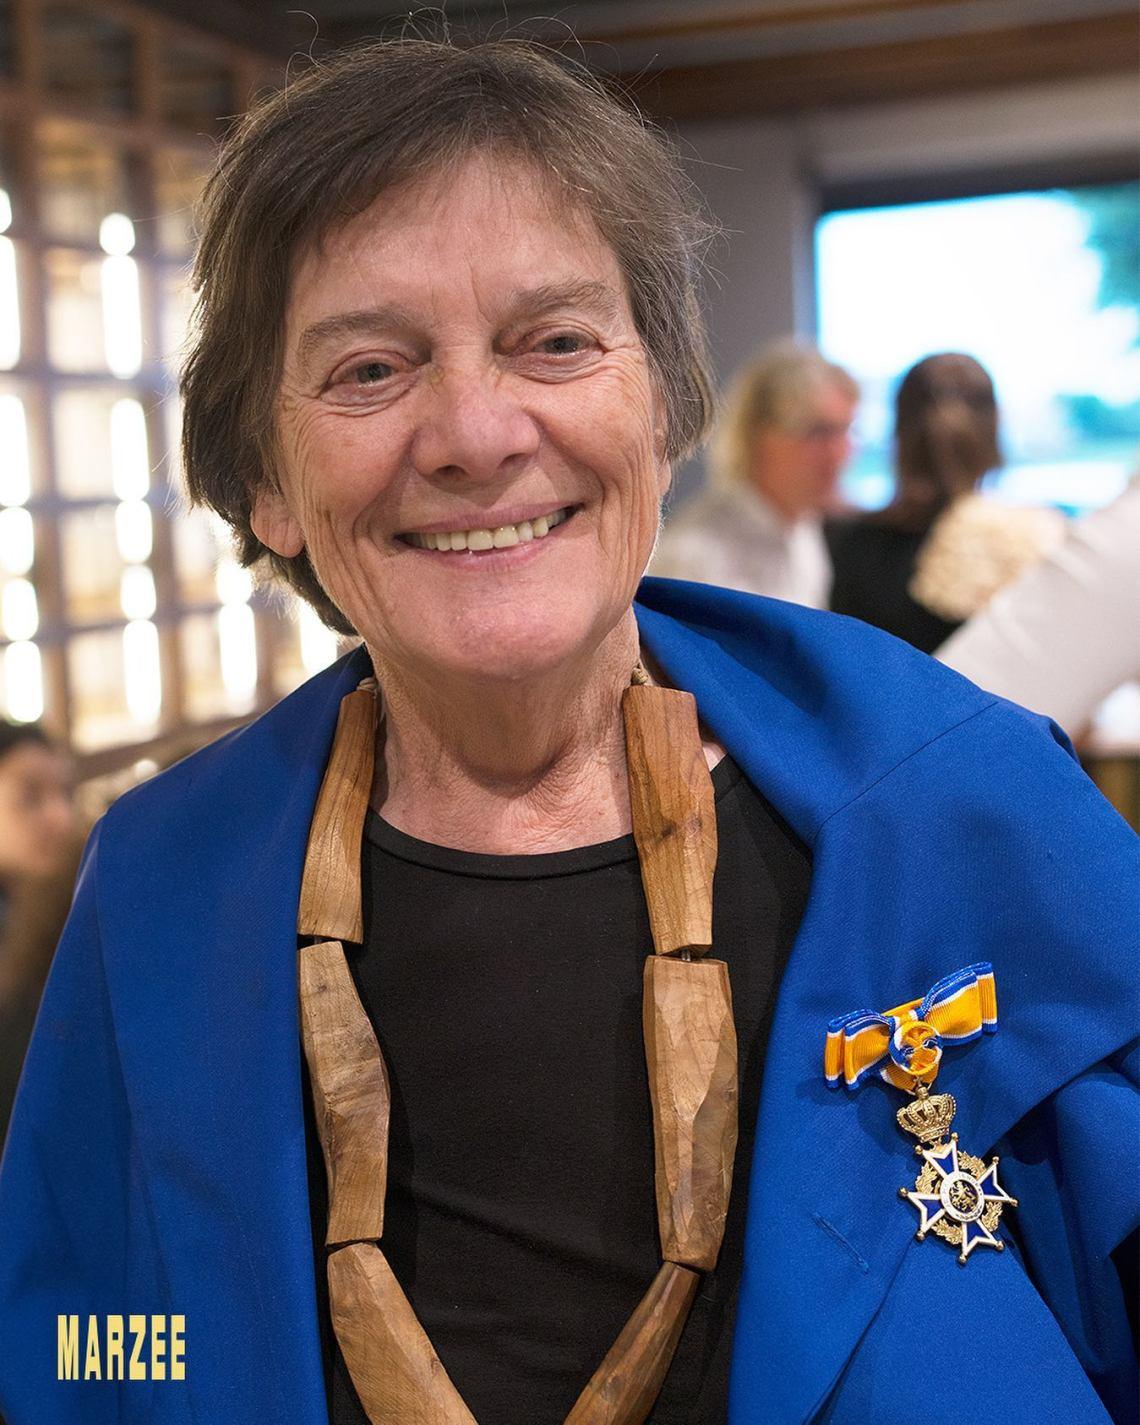 Marie-José van den Hout. PRESENT - 40 years of Galerie Marzee, 9 juni 2019. Foto met dank aan Galerie Marzee©